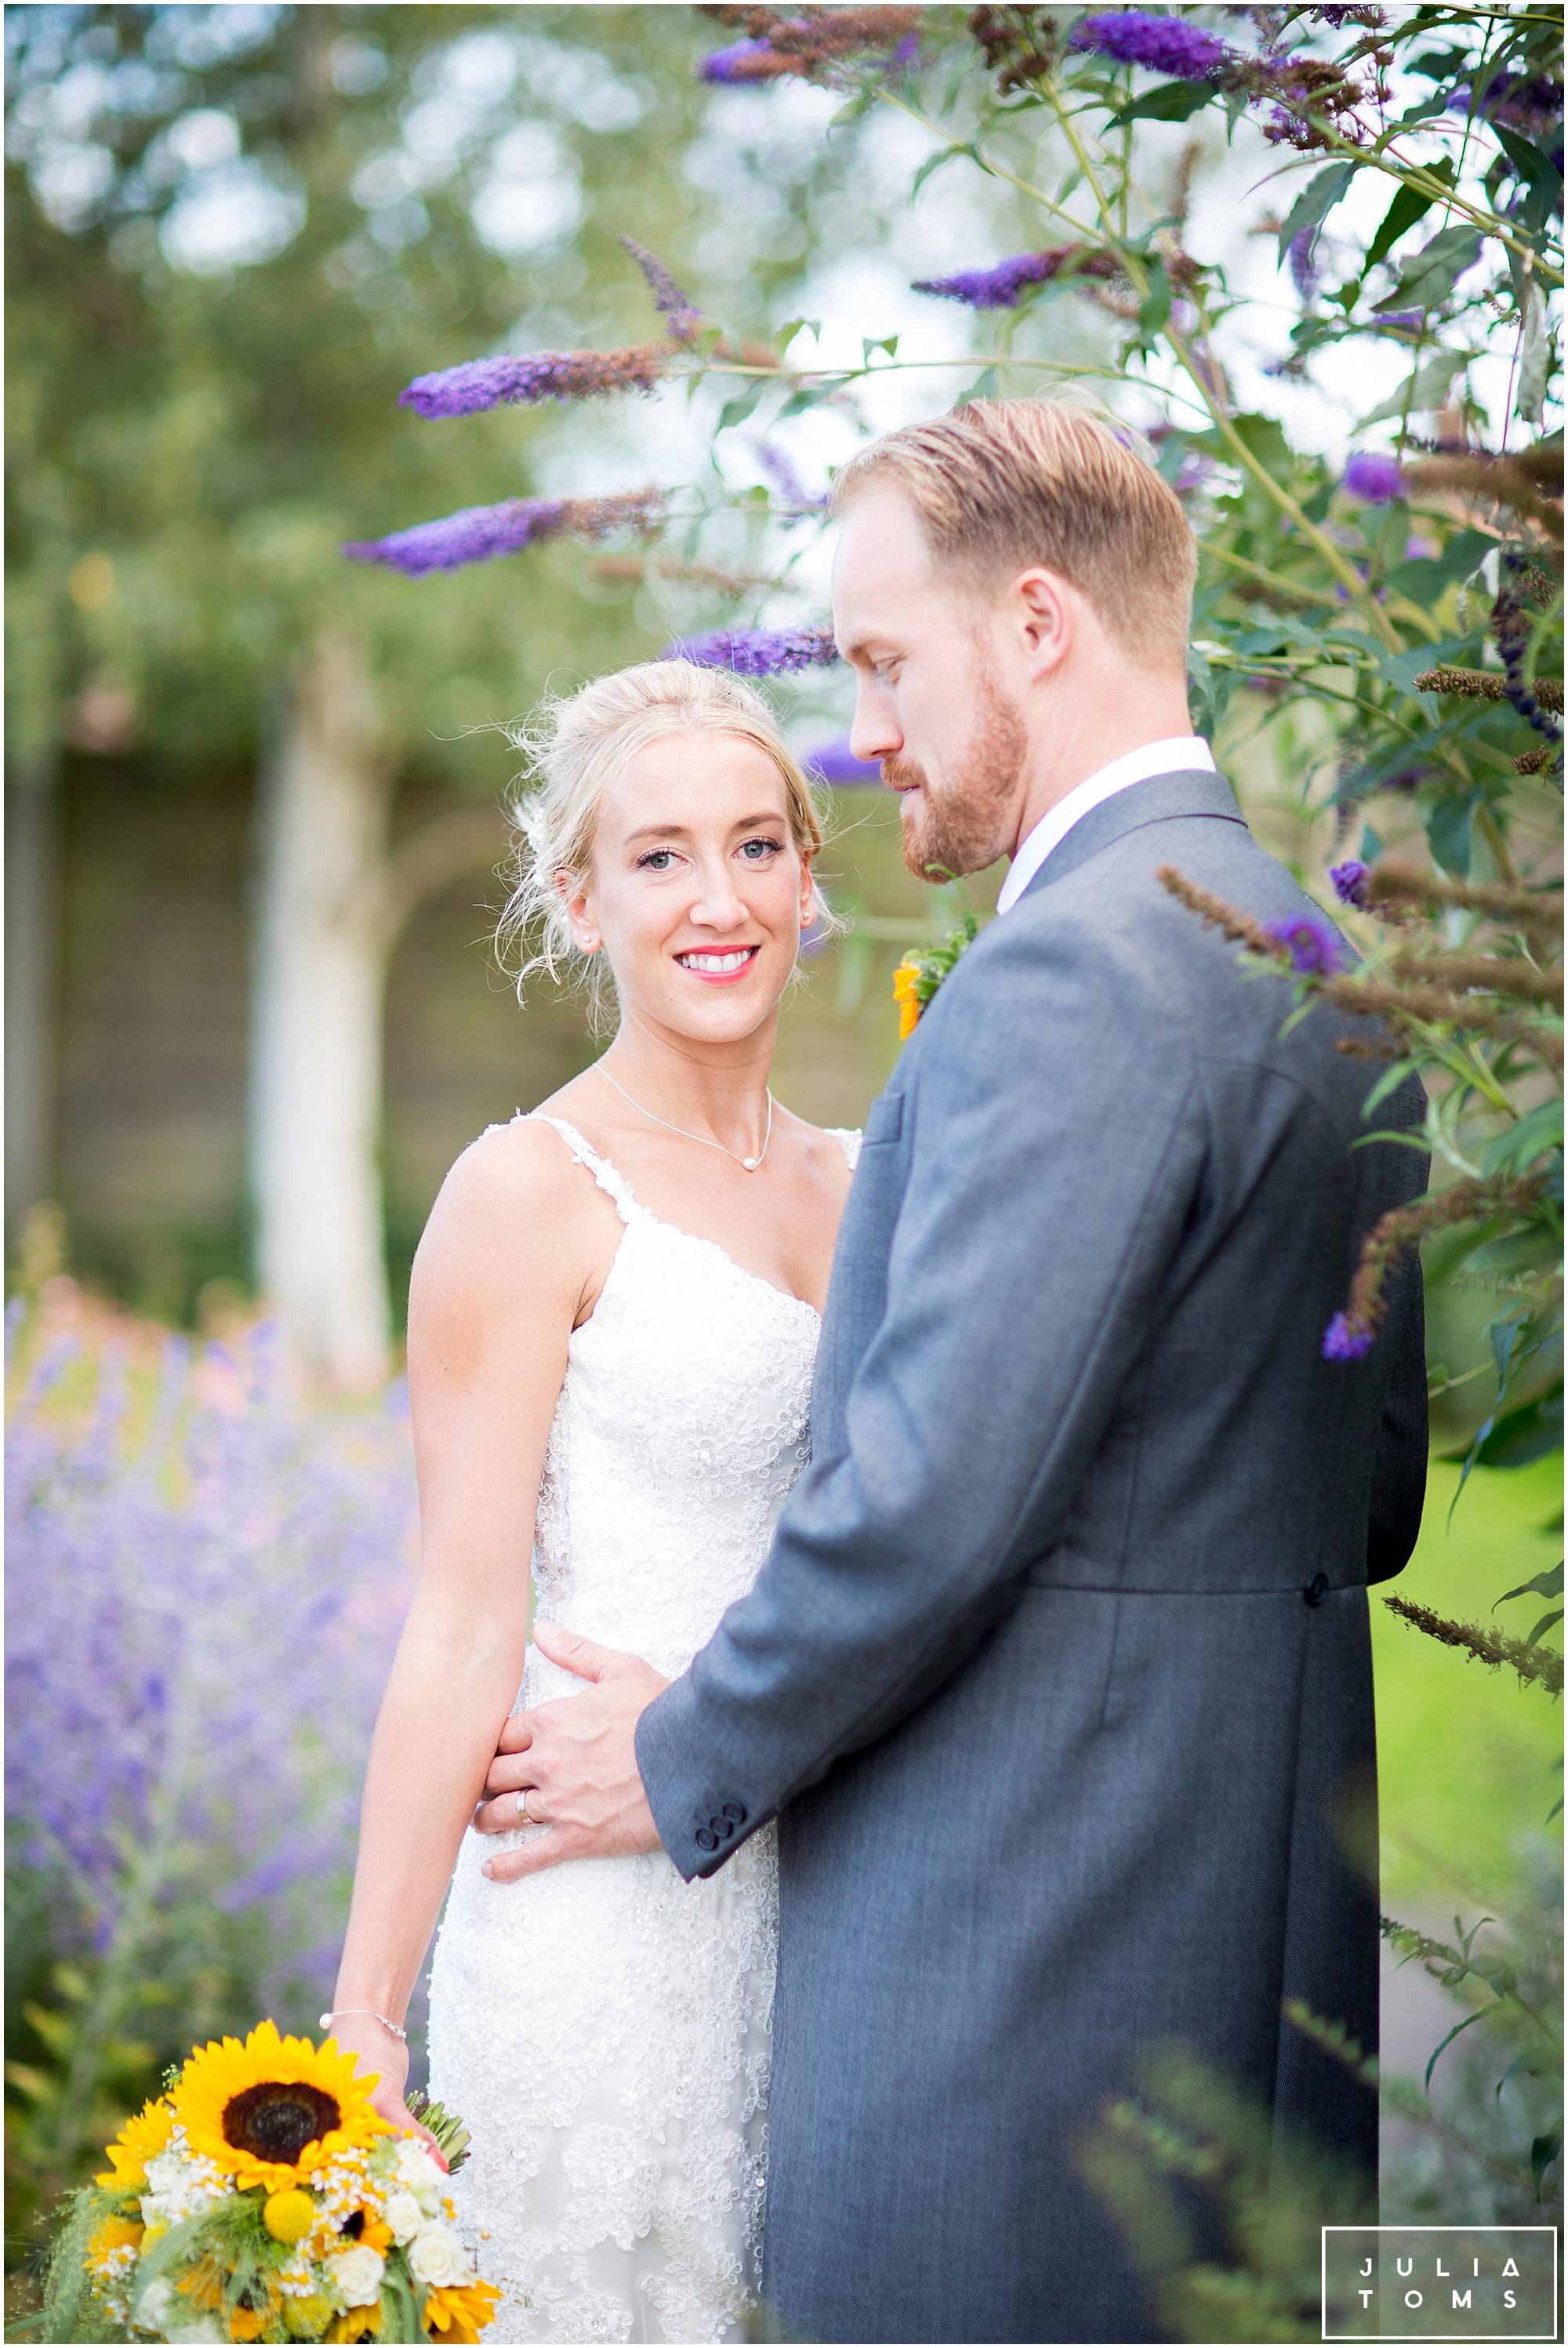 julia_toms_chichester_wedding_photographer_worthing_053.jpg